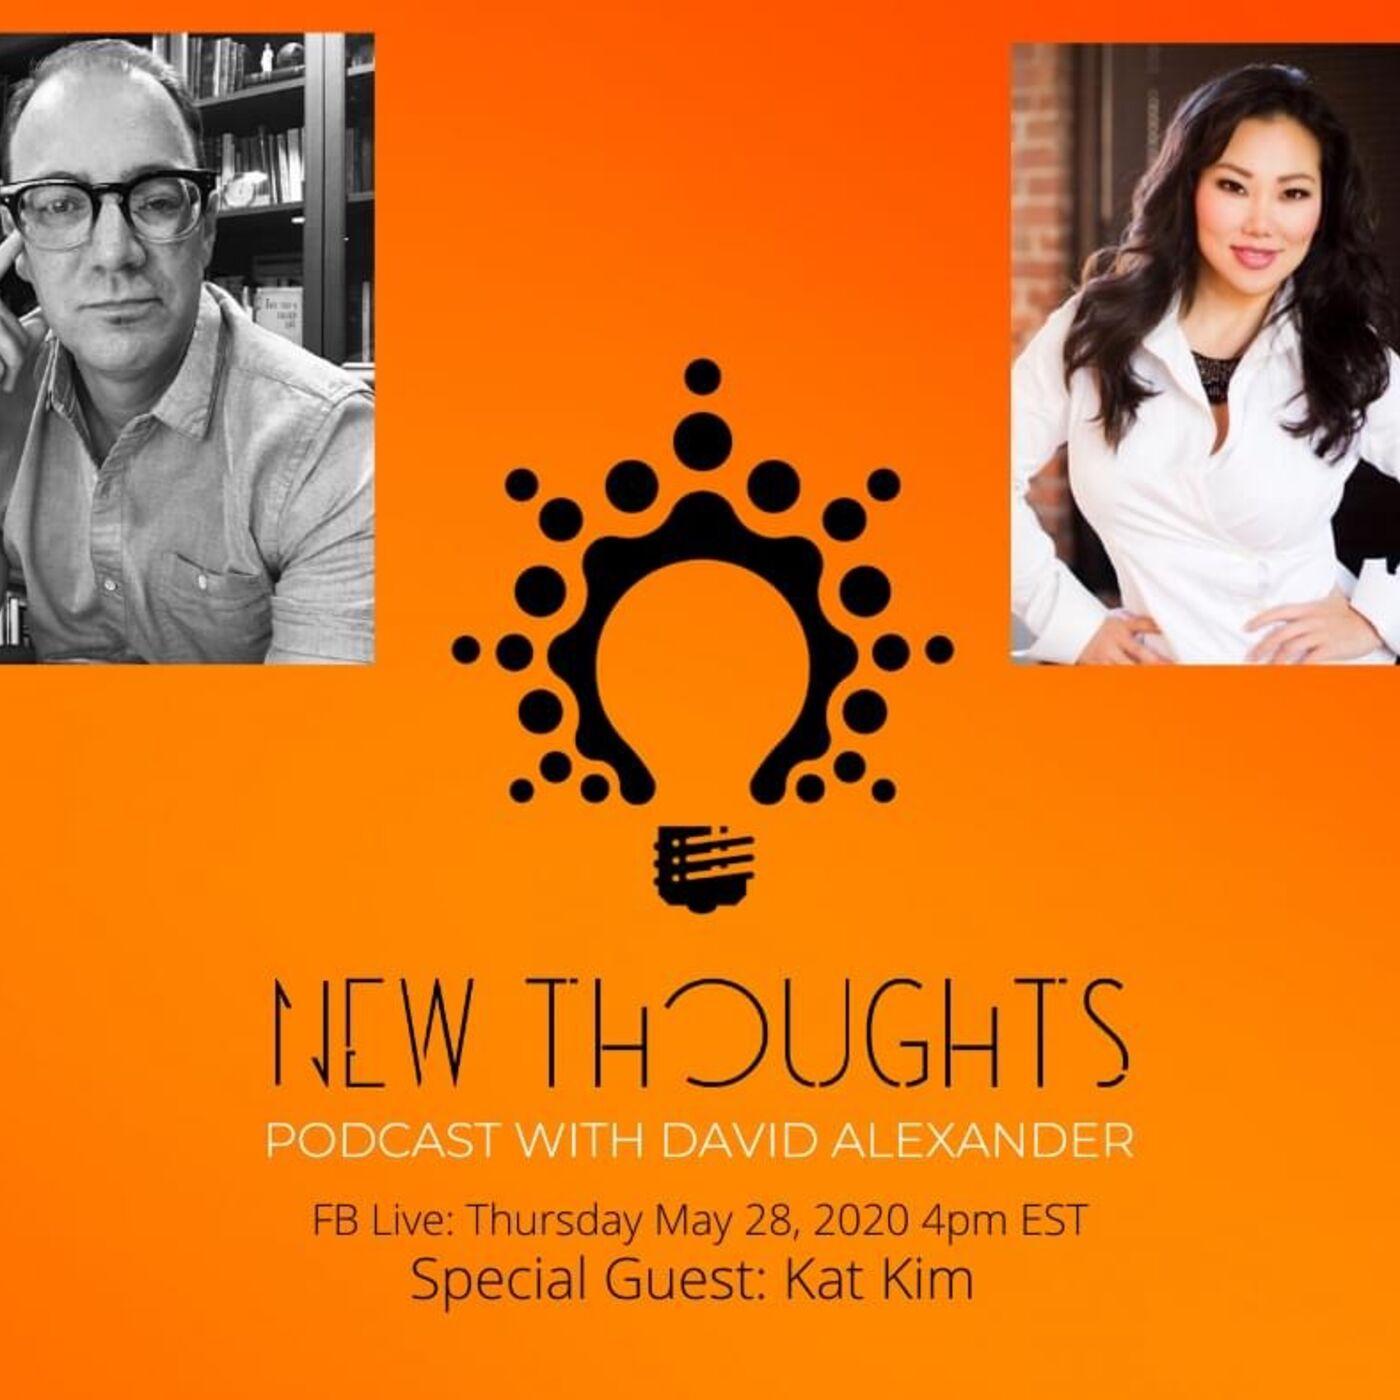 Special Guest Kat Kim - Awakening Part 1